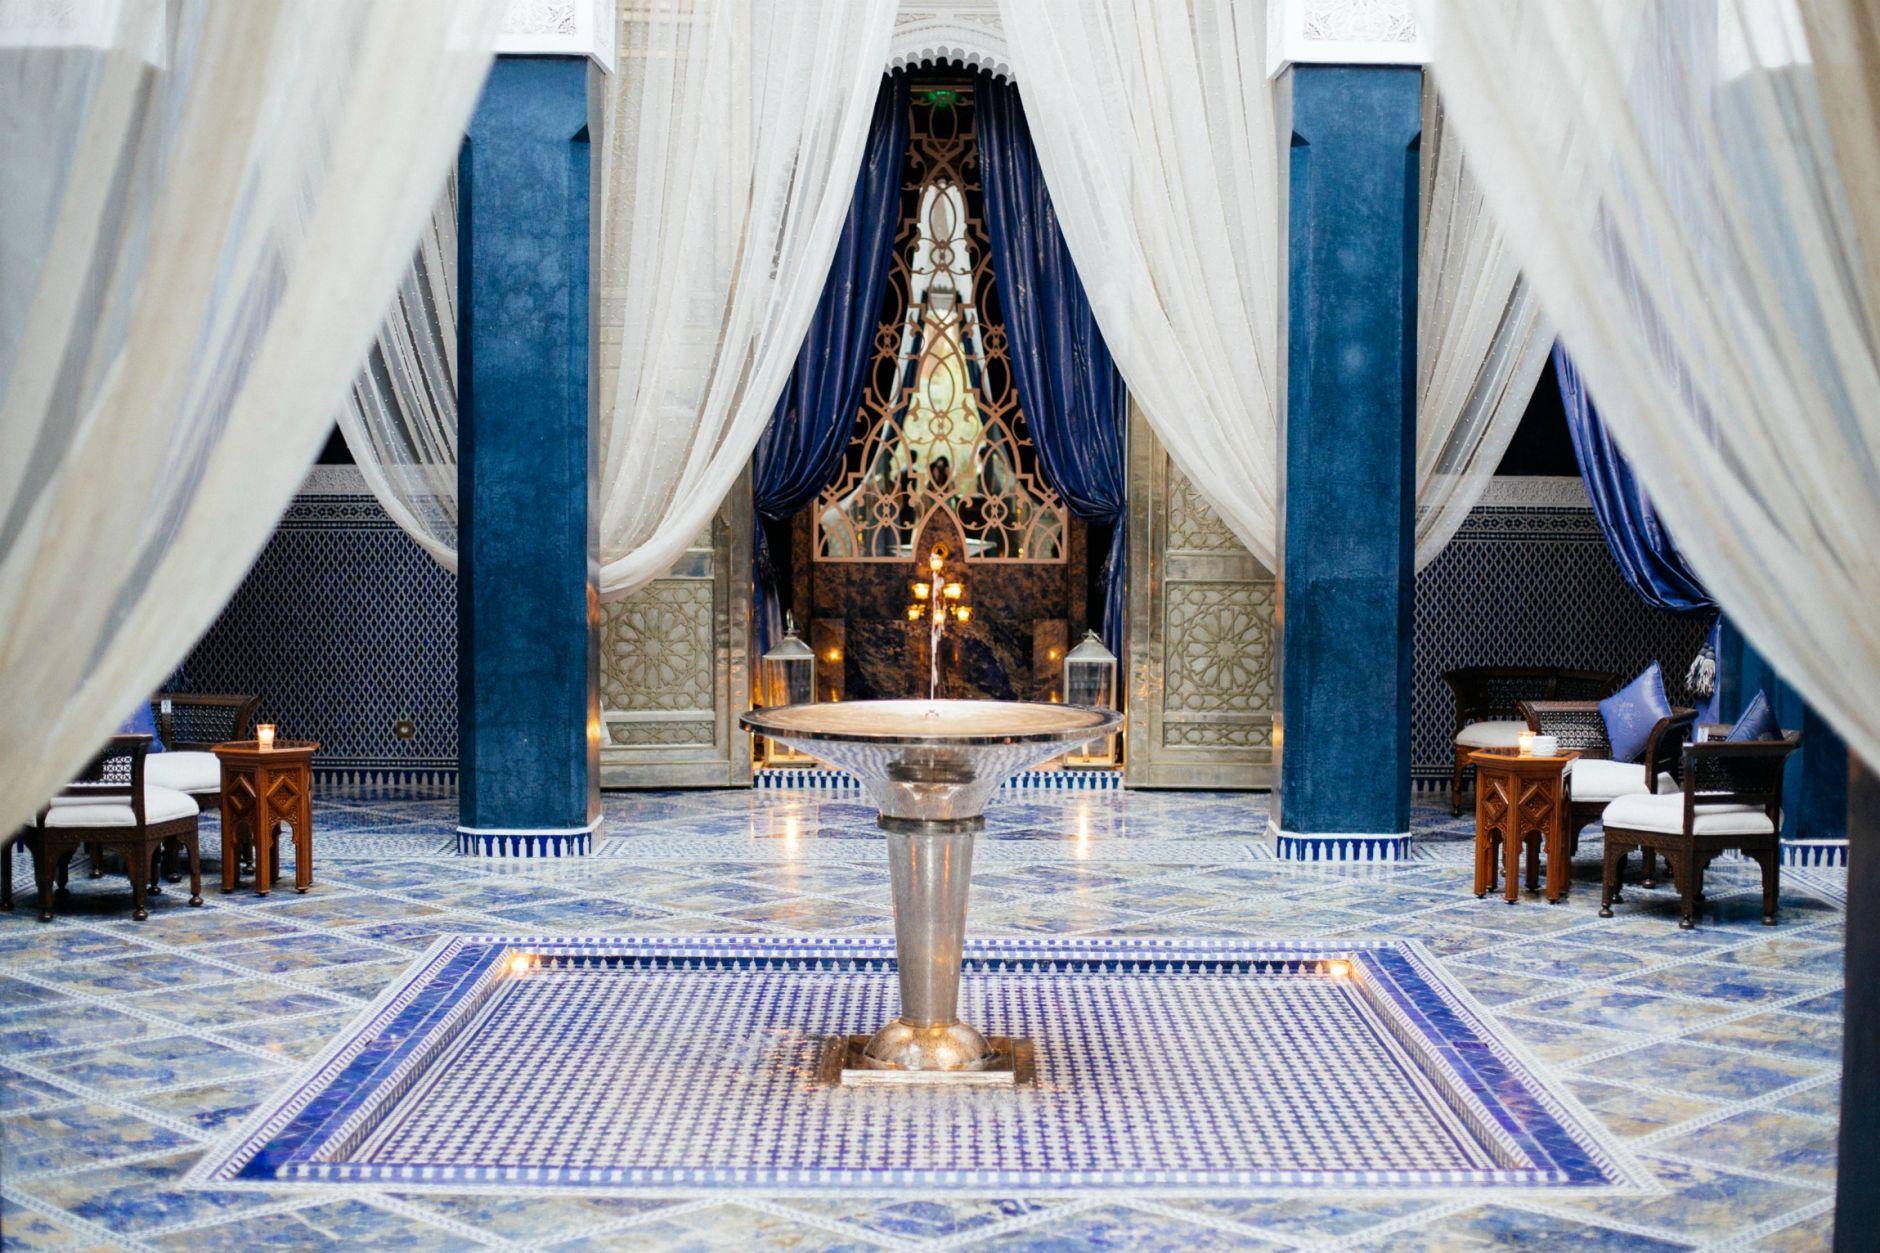 royal-mansour-hotel-luxury-marrakesch-marrakesh-morocco-edisa-shahini-disicouture-blog-50